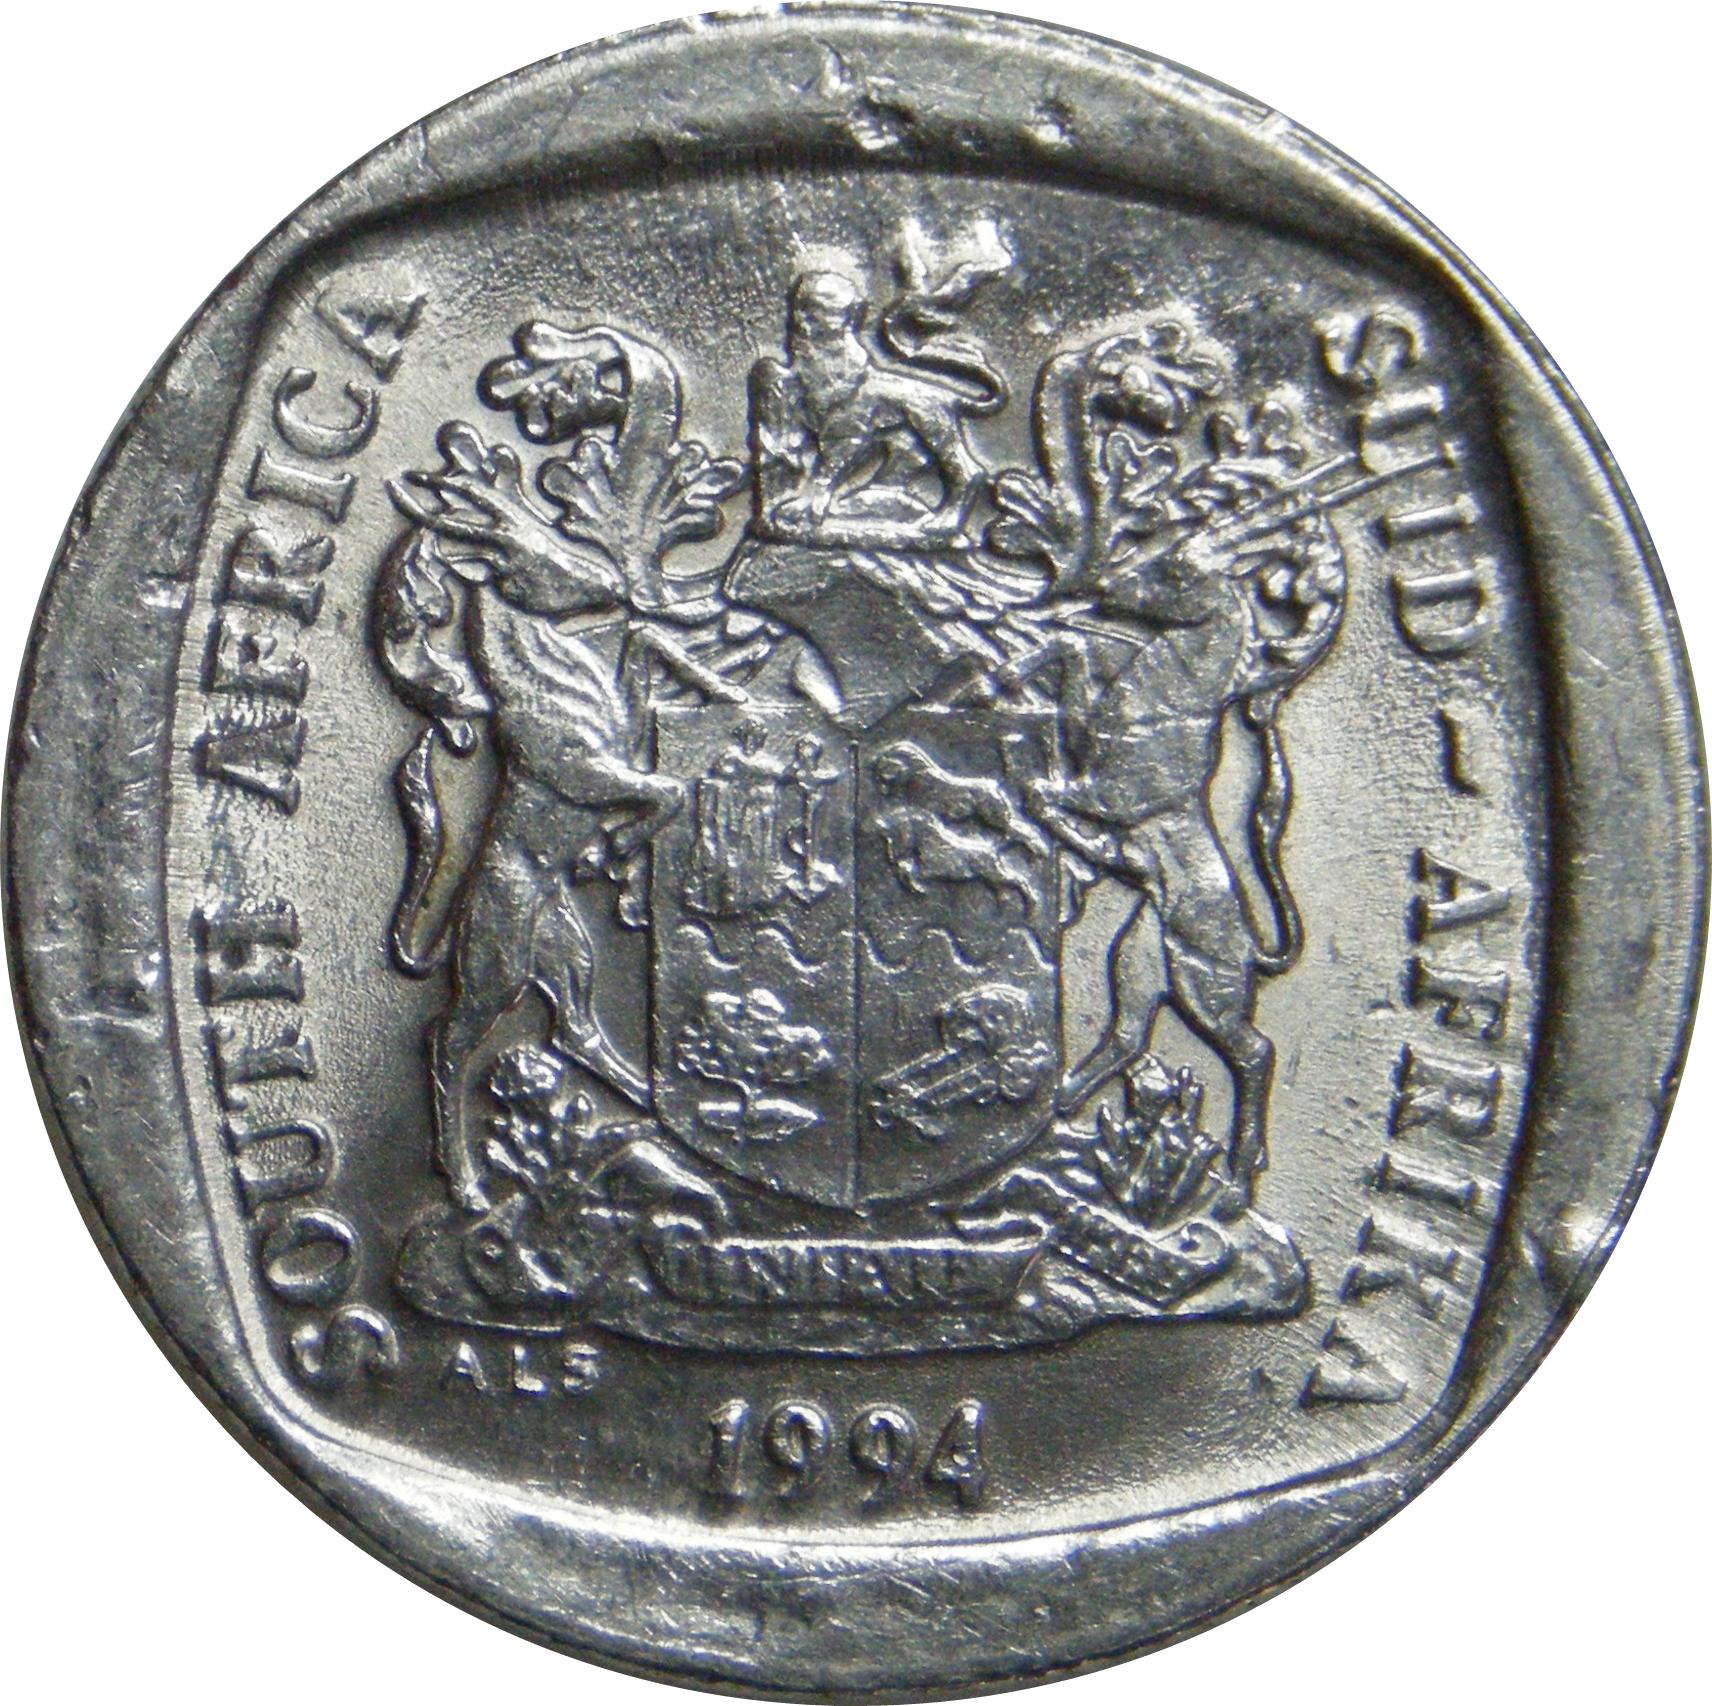 1 rand south africa suid afrika south africa numista